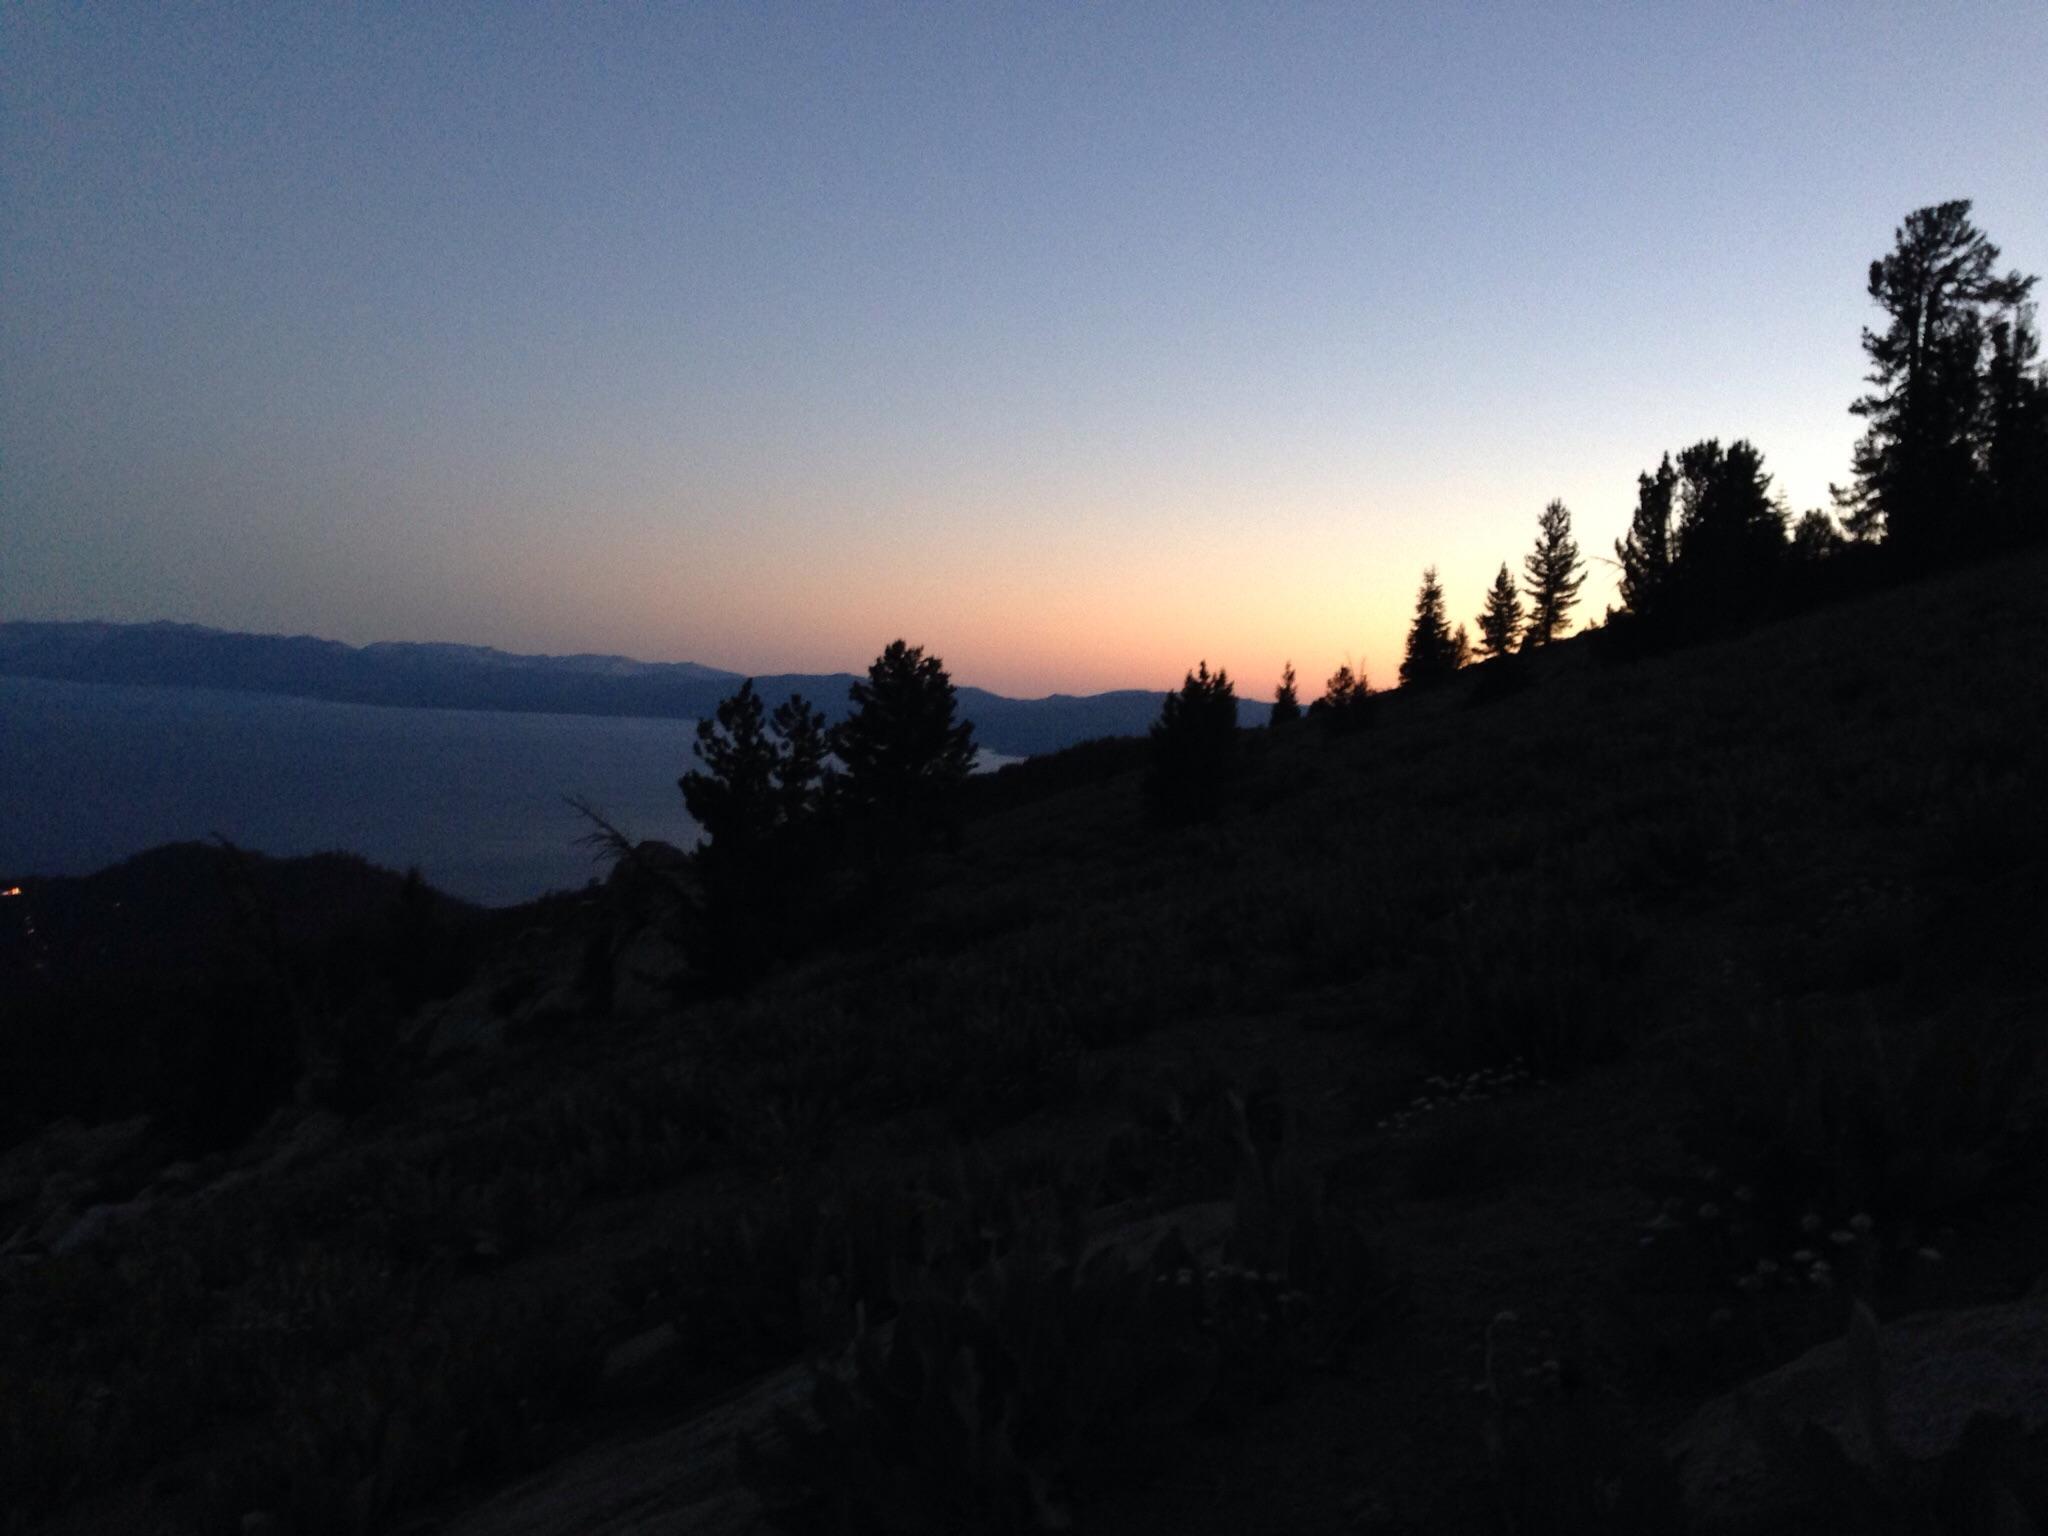 The last bit of sunset Saturday night